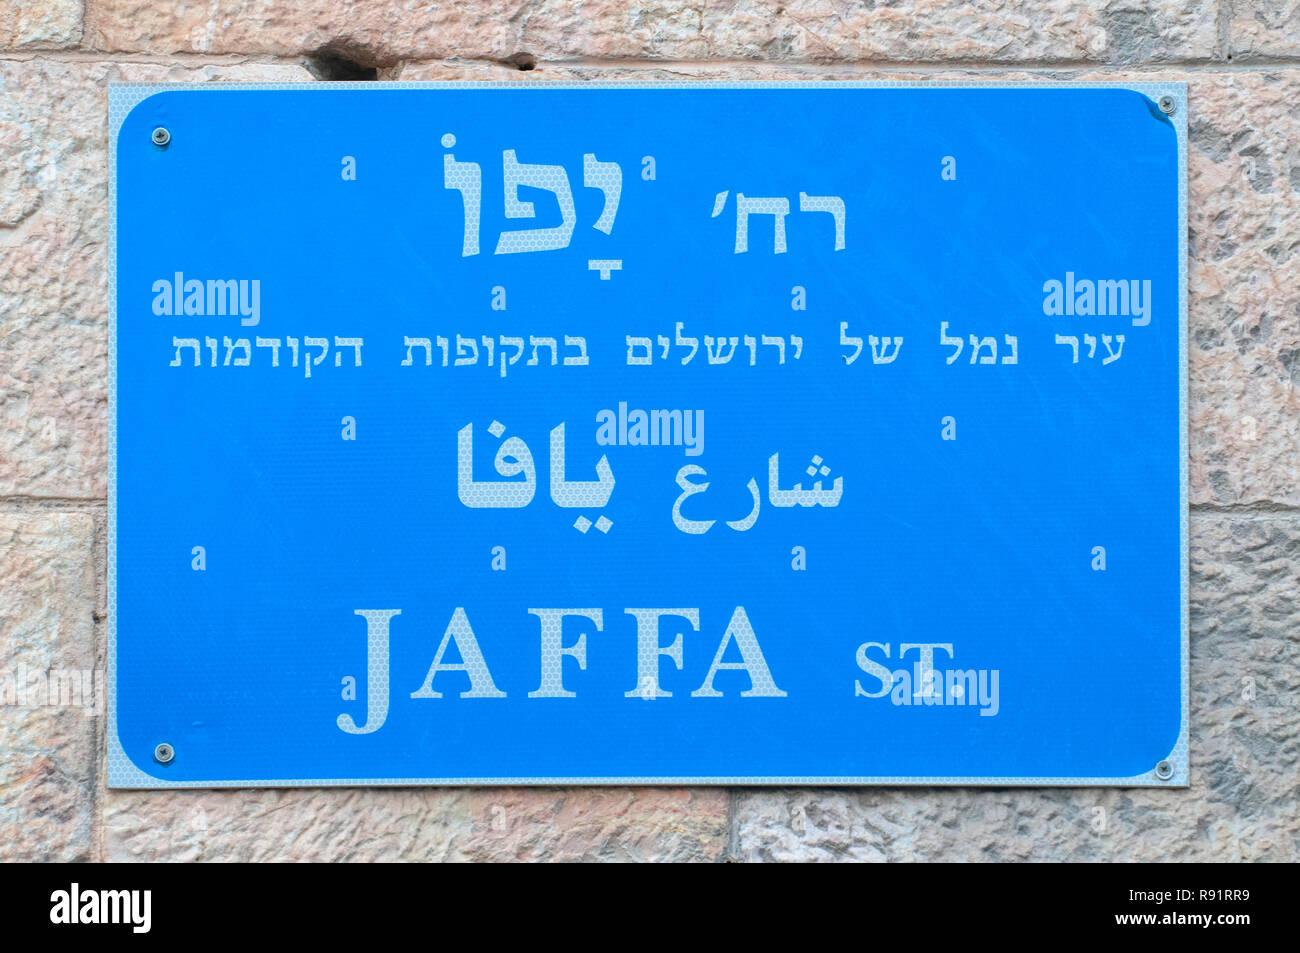 Street sign of Jaffa Street in Jerusalem, Israel - Stock Image